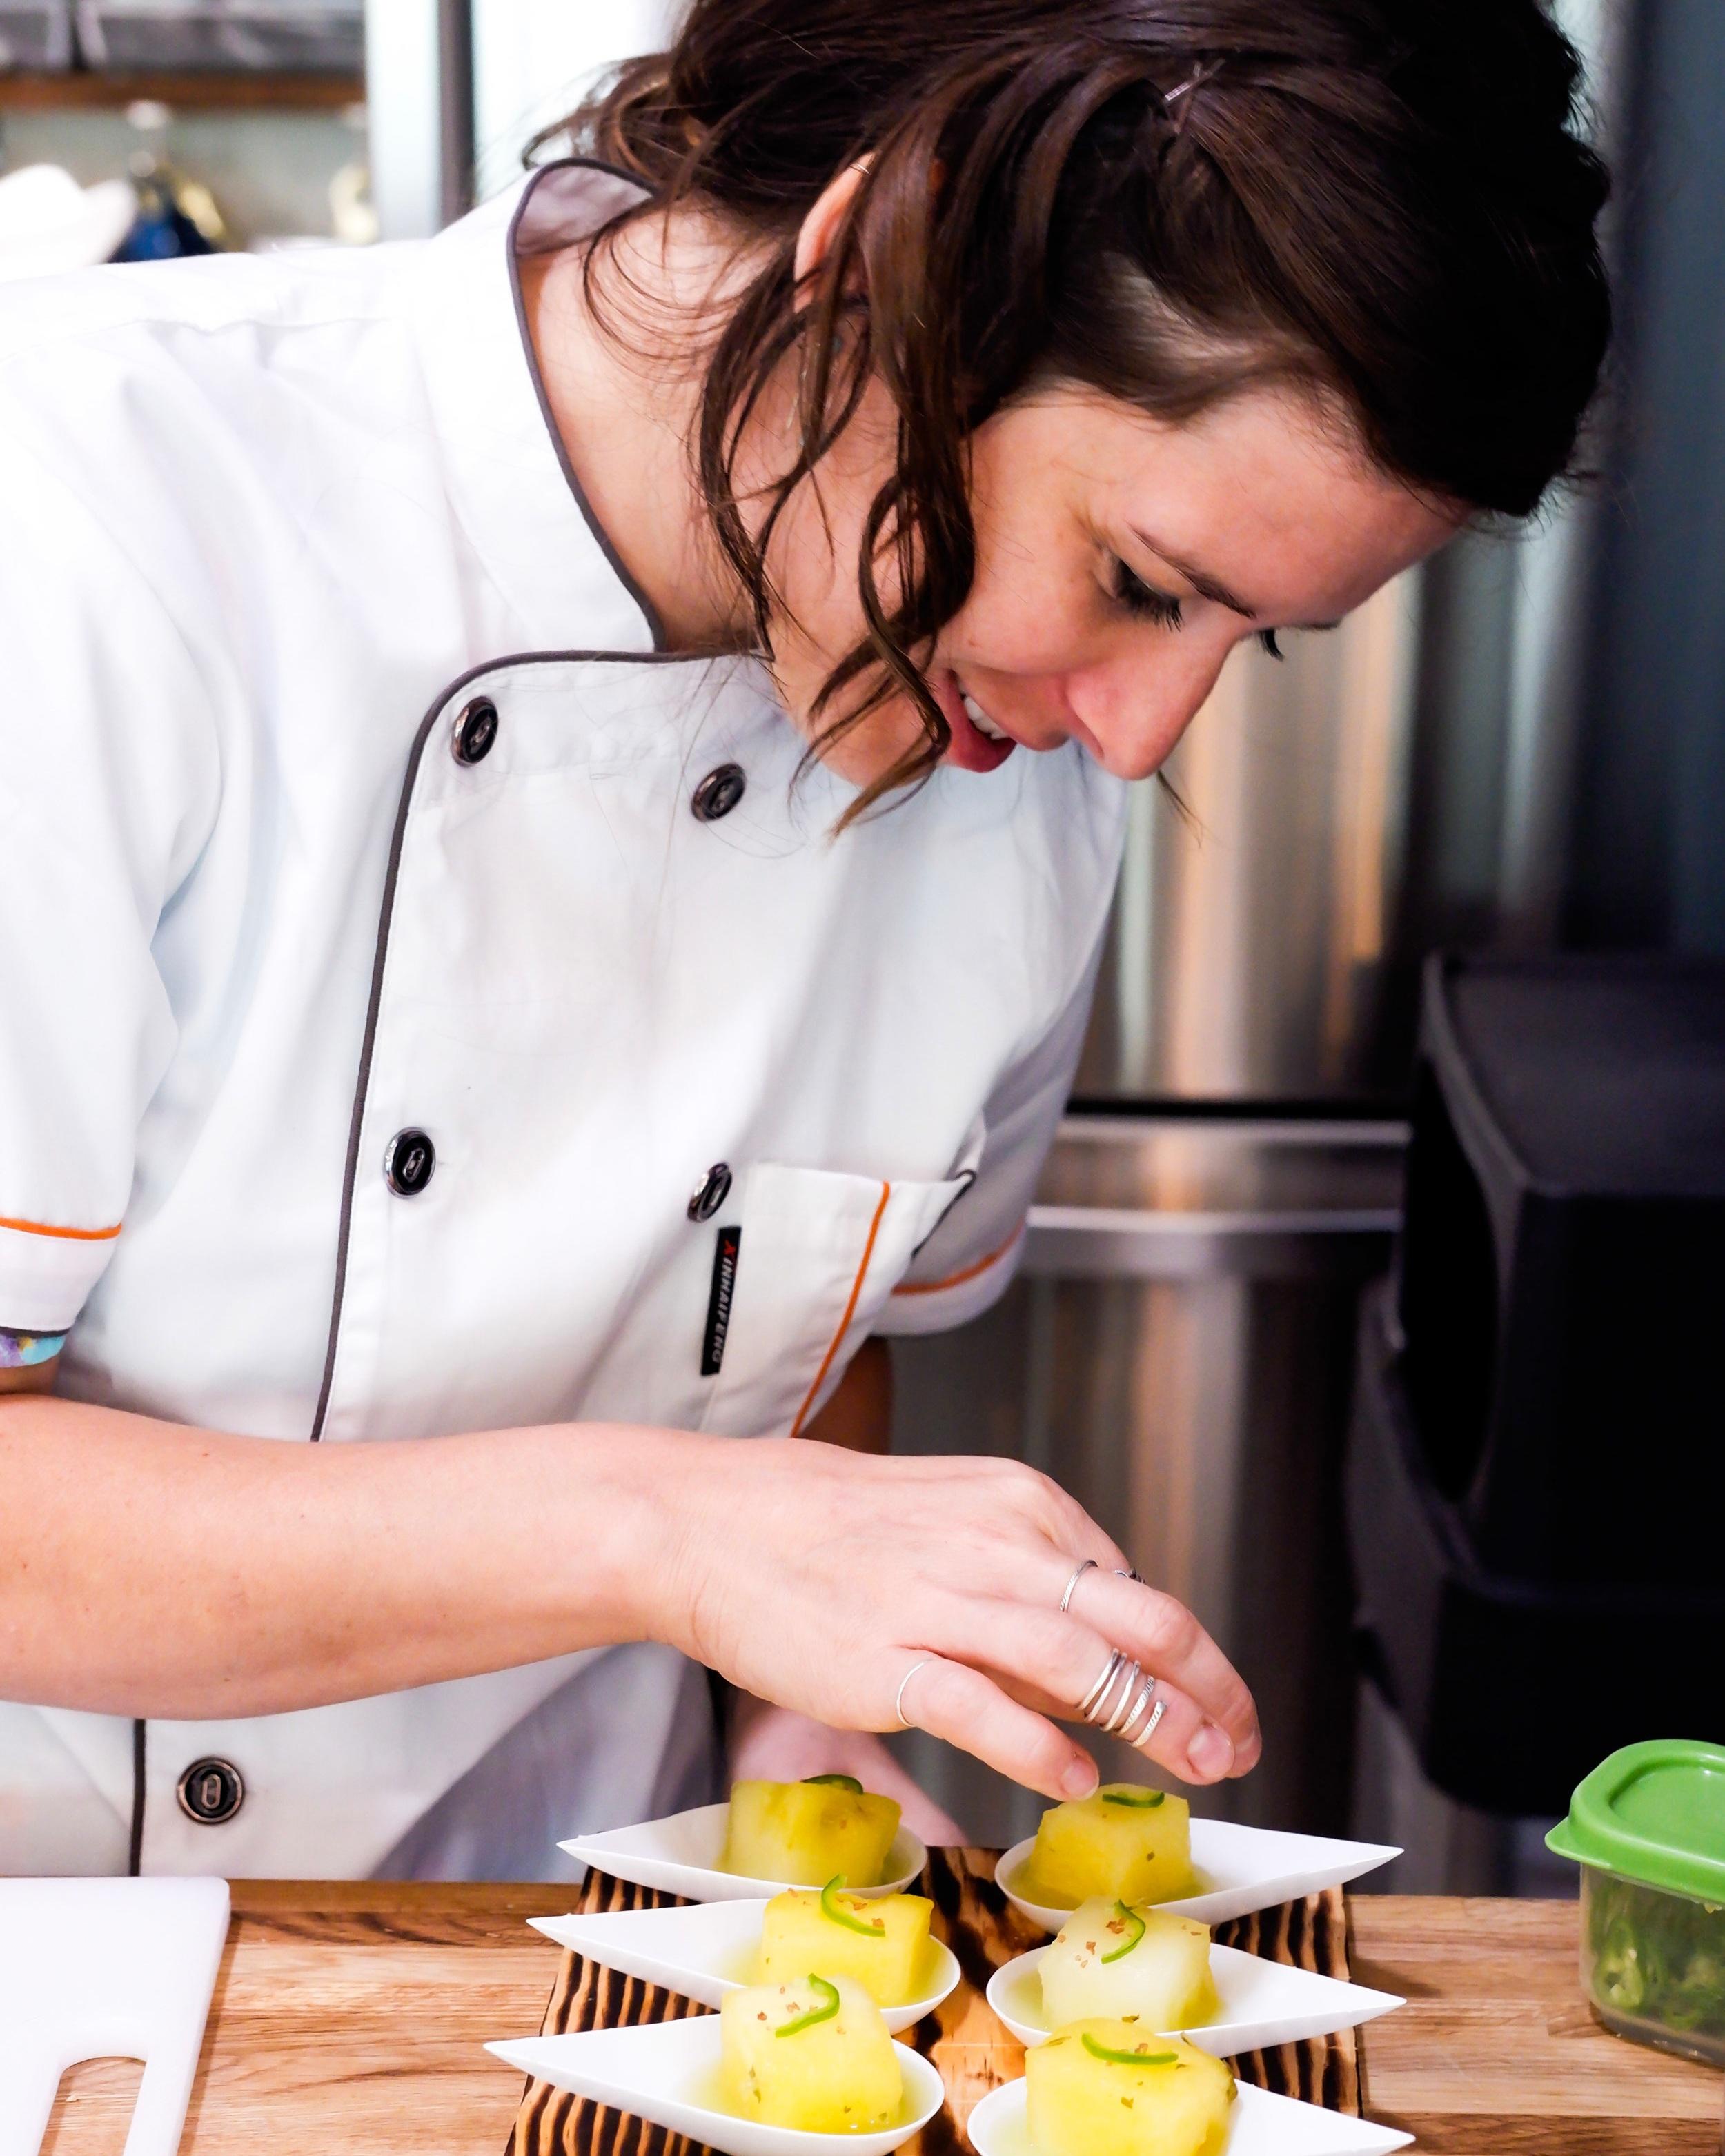 - Retreats & WorkshopsSmall EventsPop-ups & Street FoodFamily Style MealsCooking Class & DemosFood Empowerment CausesMeal Prep & Nutrition Consultation